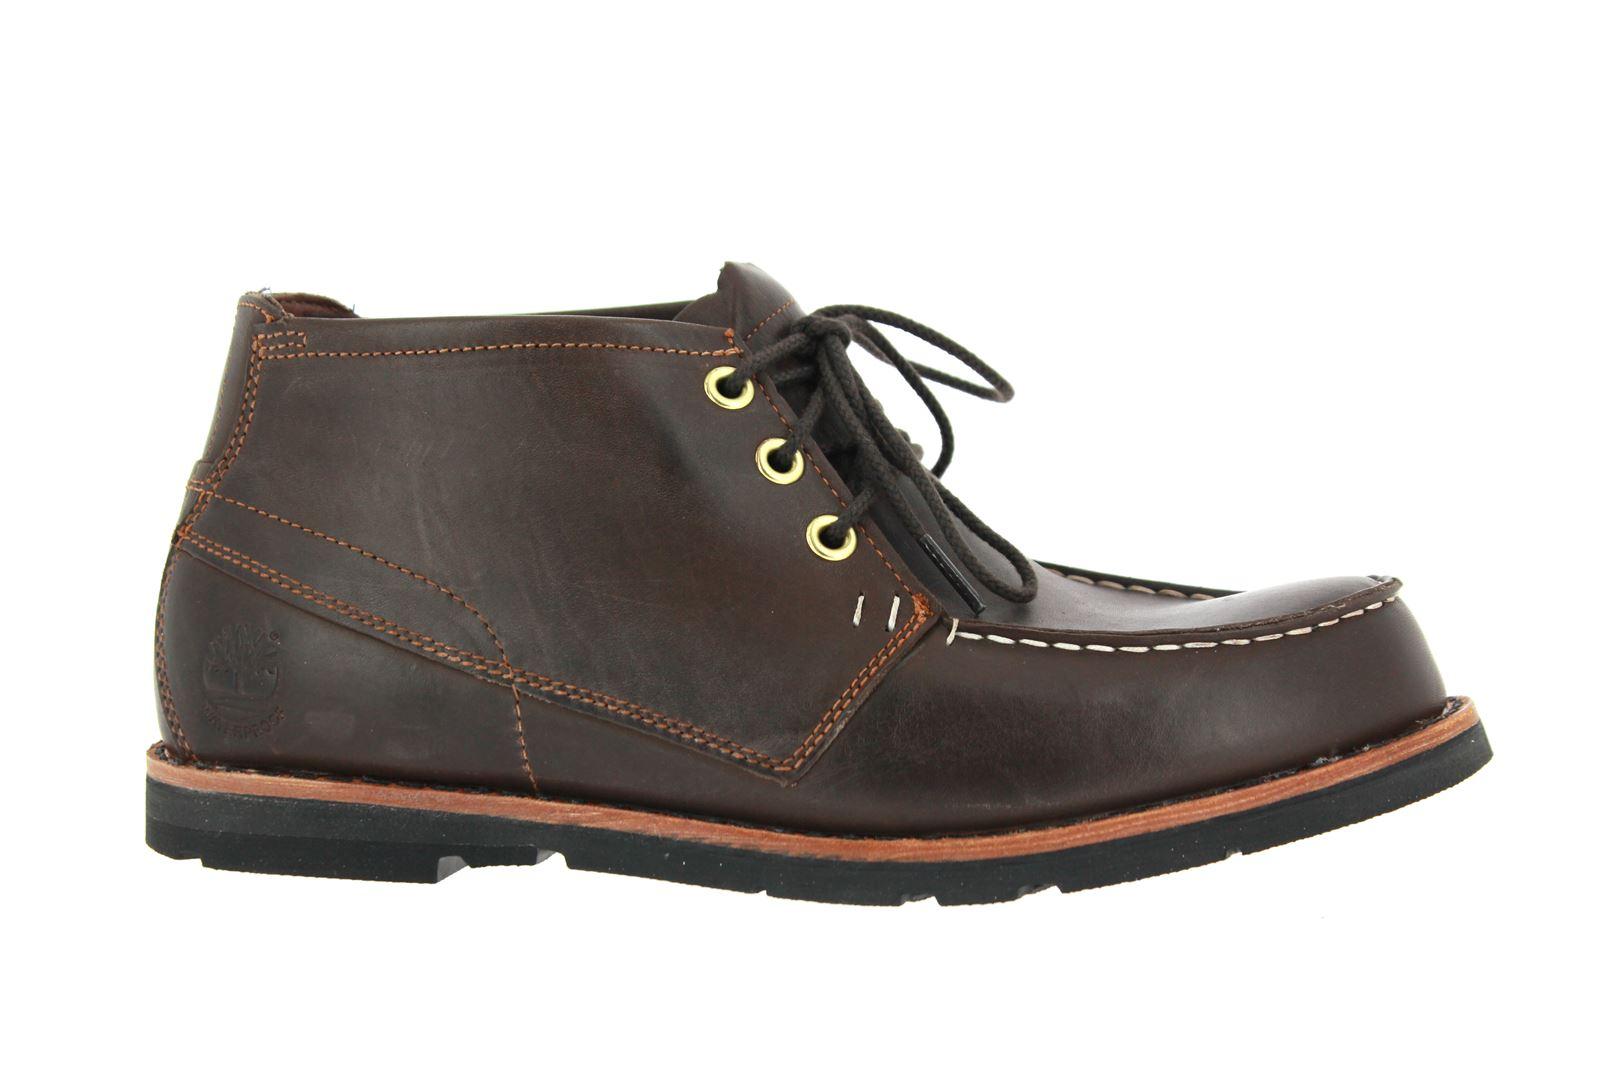 Timberland Laced Boot RUGGED CHUKKA DARK BROWN